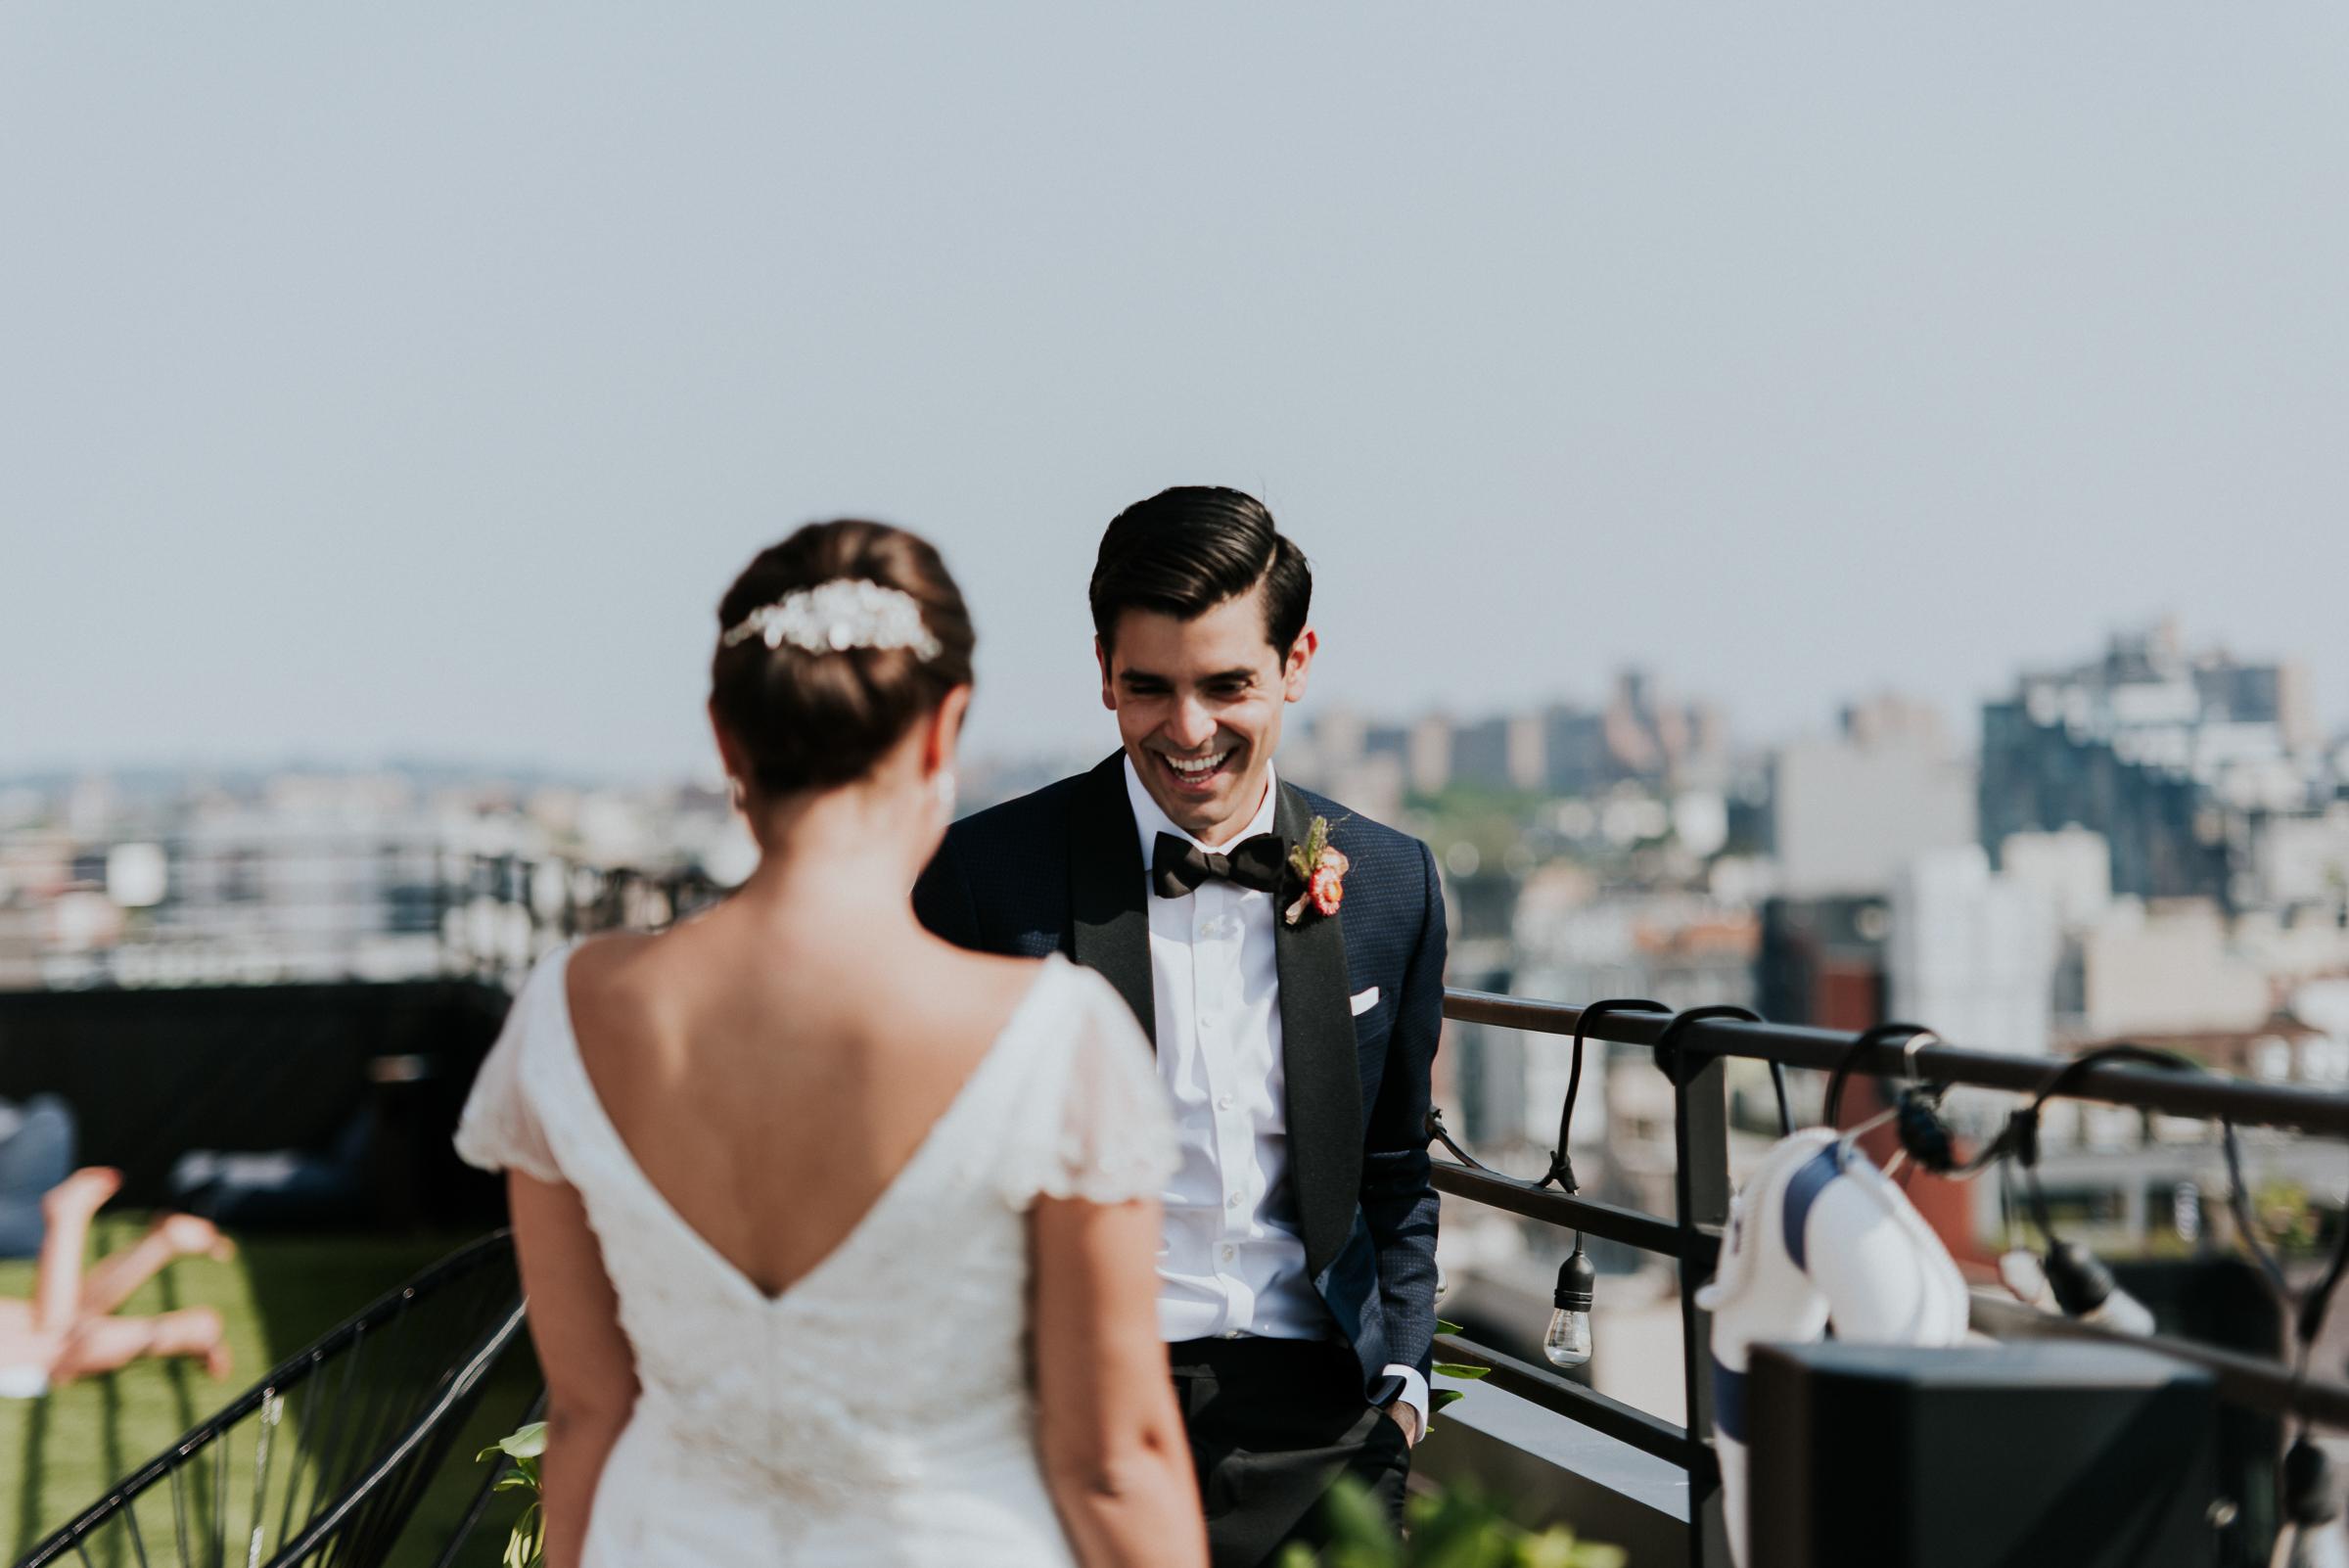 Brooklyn-Winery-NYC-Editorial-Documentary-Wedding-Photographer-Gina-Oli-28.jpg